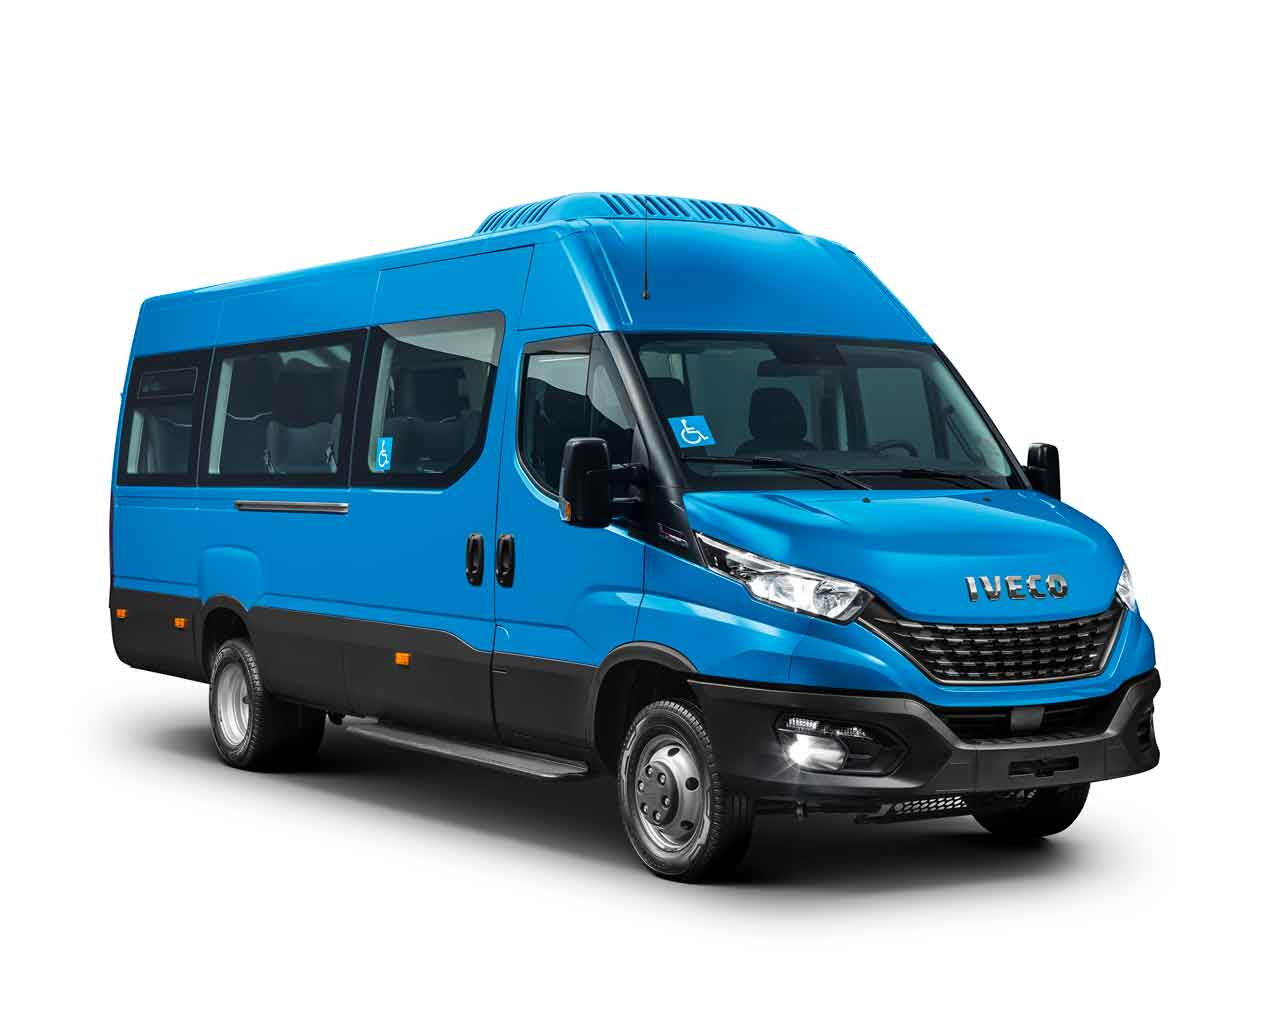 Van Iveco Daily Minibus